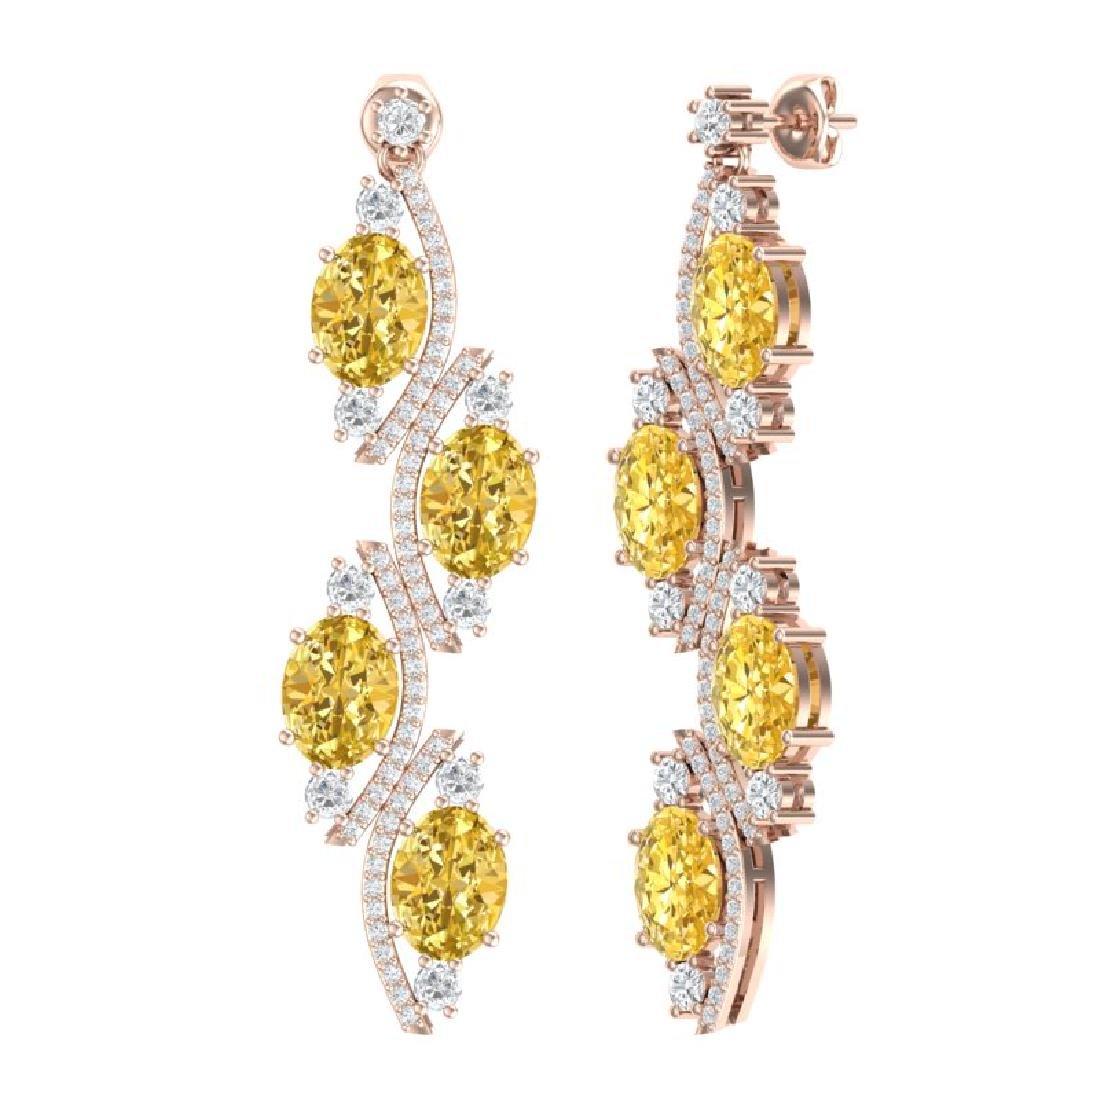 13.32 CTW Royalty Canary Citrine & VS Diamond Earrings - 3